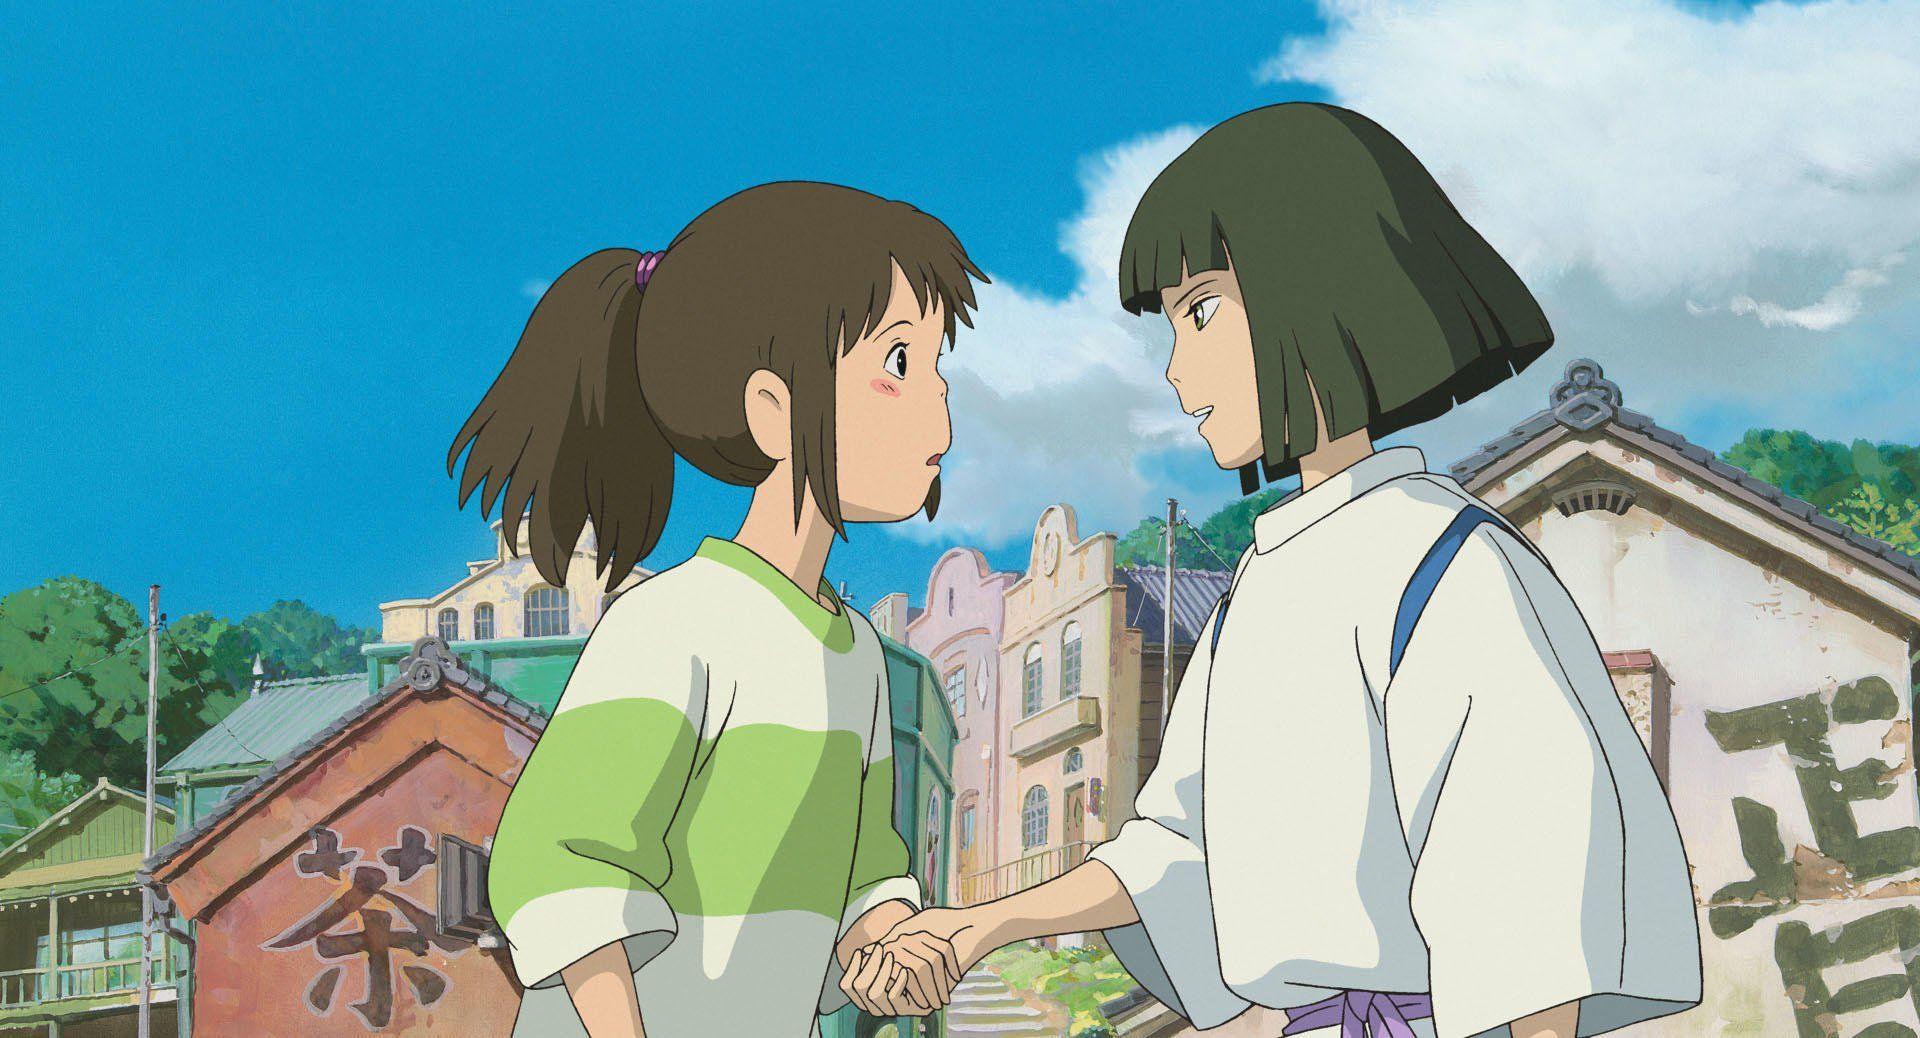 Studio Ghibli's Free To Use Image Library | MATCHA - JAPAN TRAVEL WEB MAGAZINE